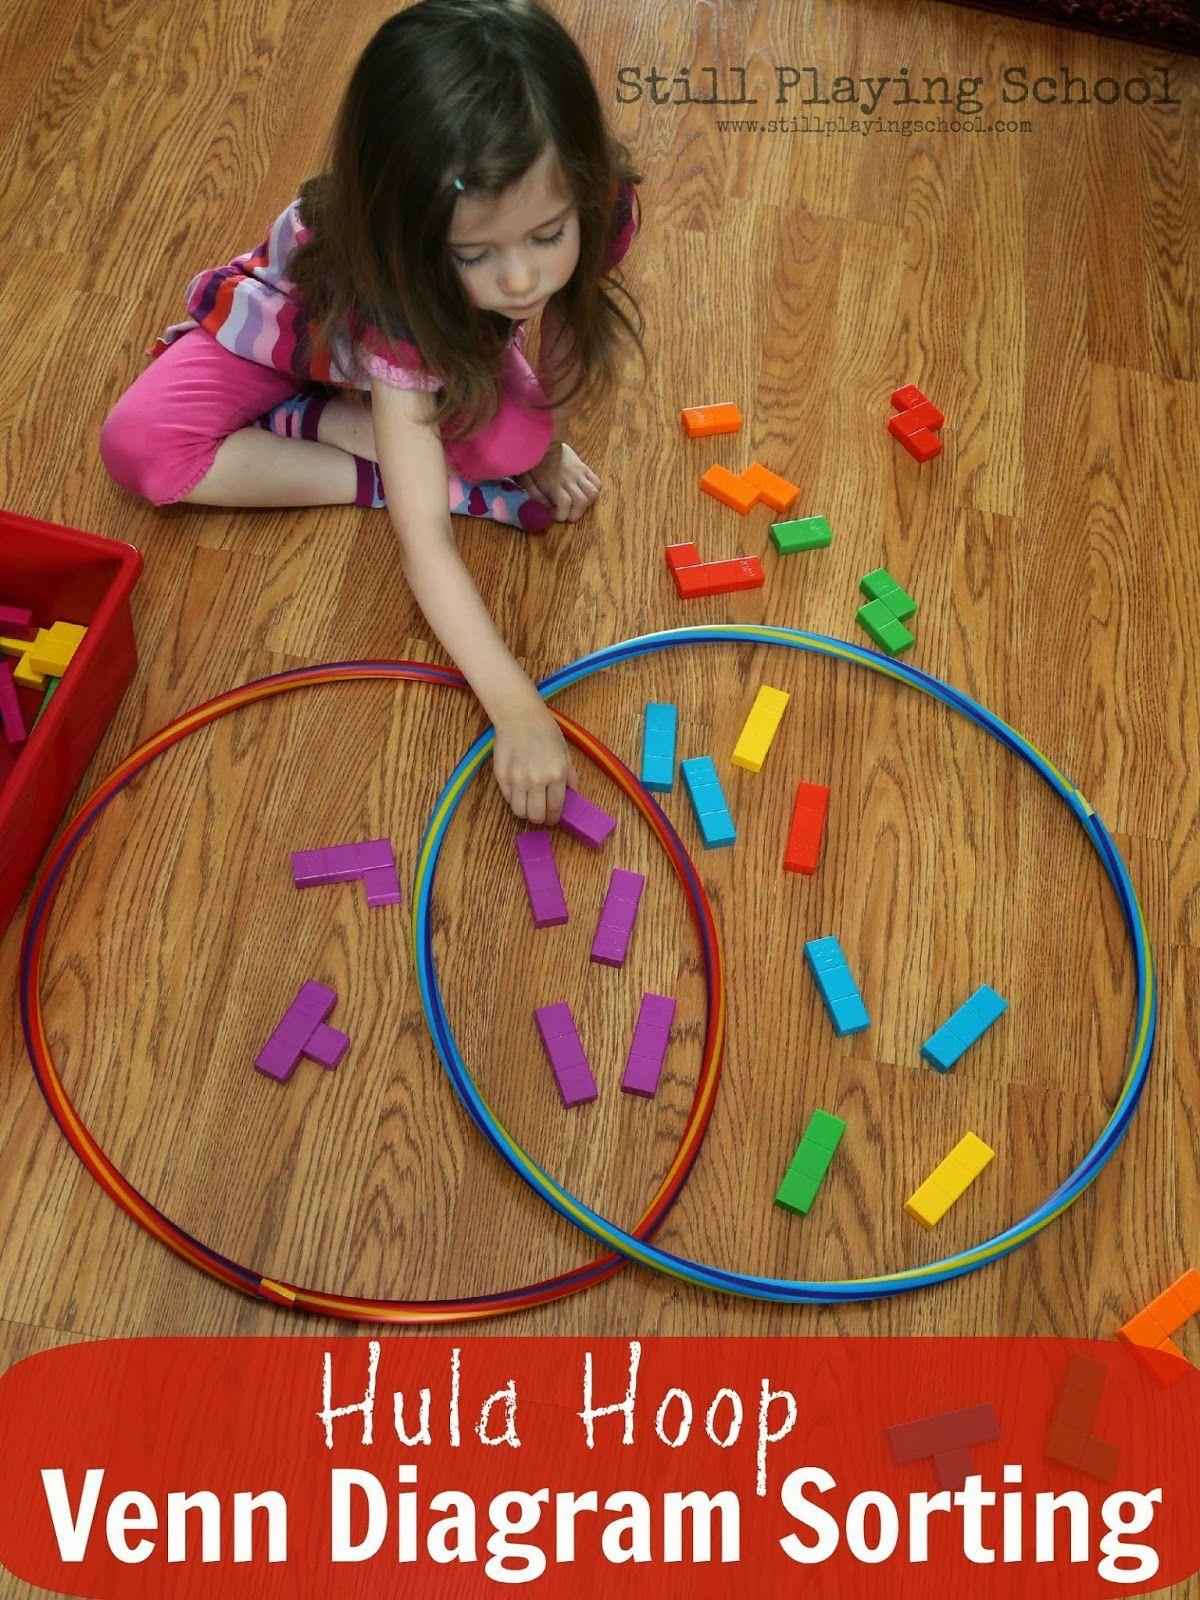 hula hoop venn diagram sorting venn diagrams math classroom kindergarten math classroom ideas [ 1200 x 1600 Pixel ]